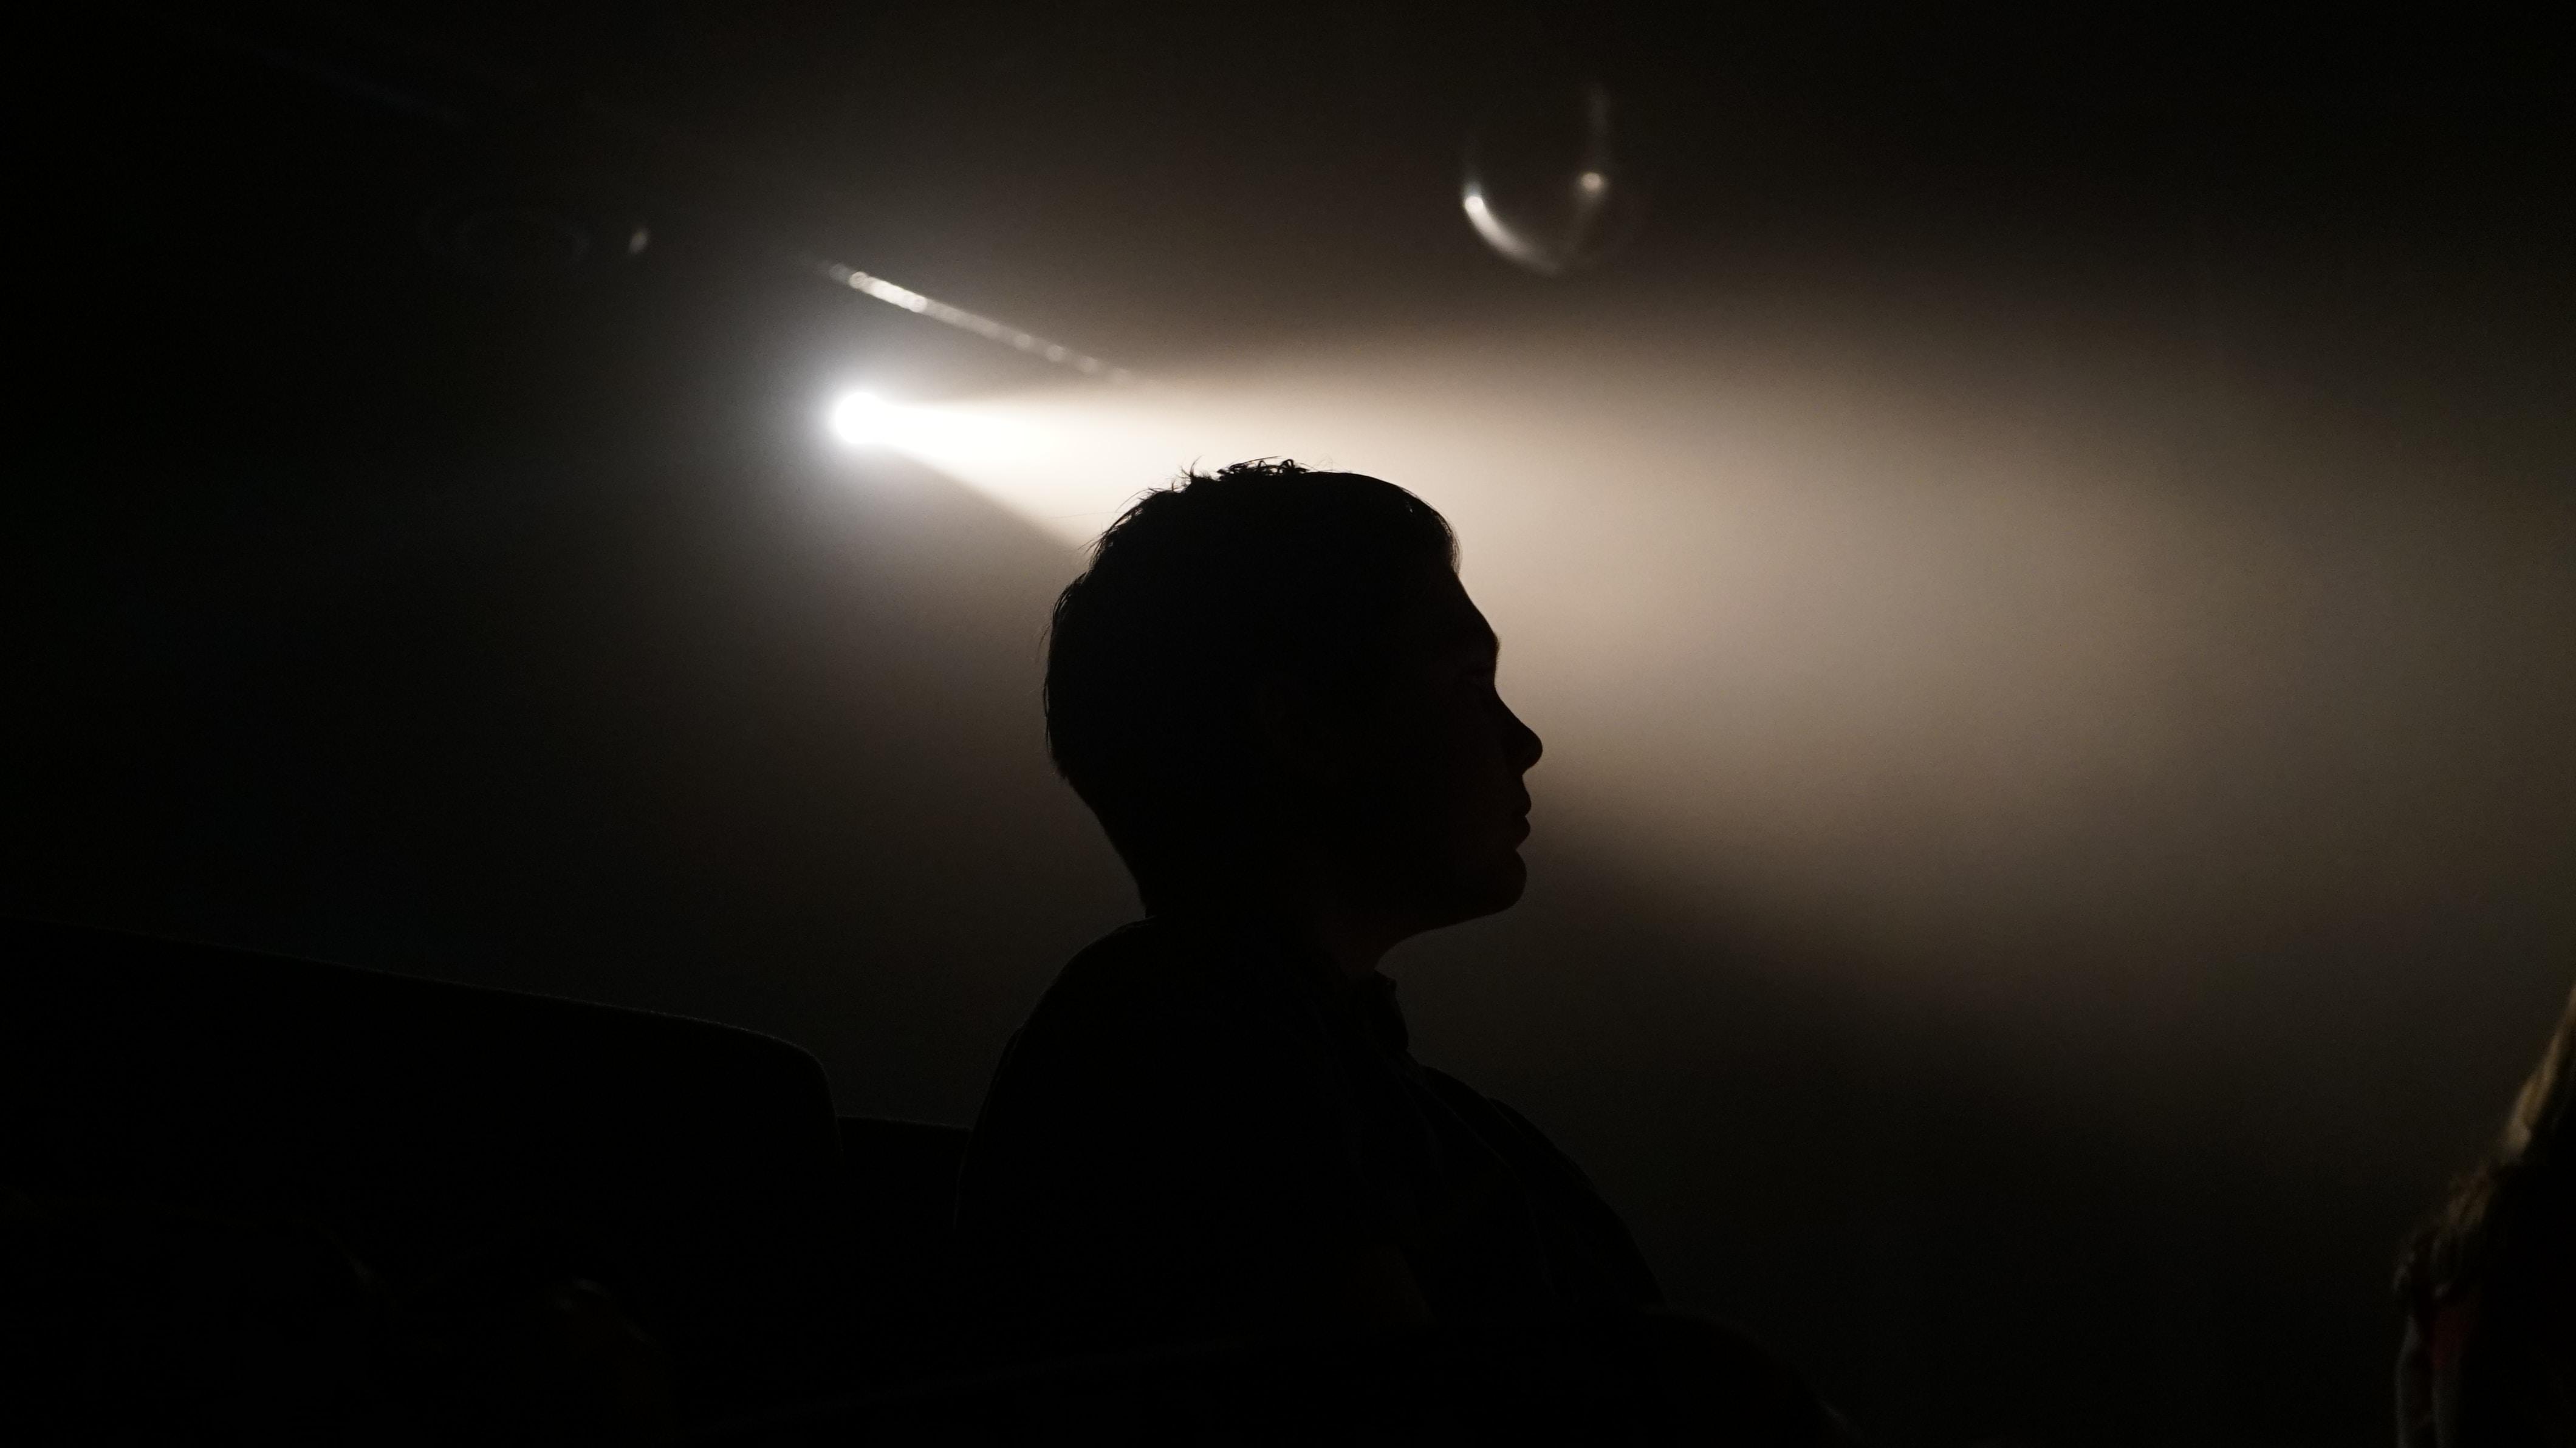 The silhouette of a person in Rancho Santa Fe